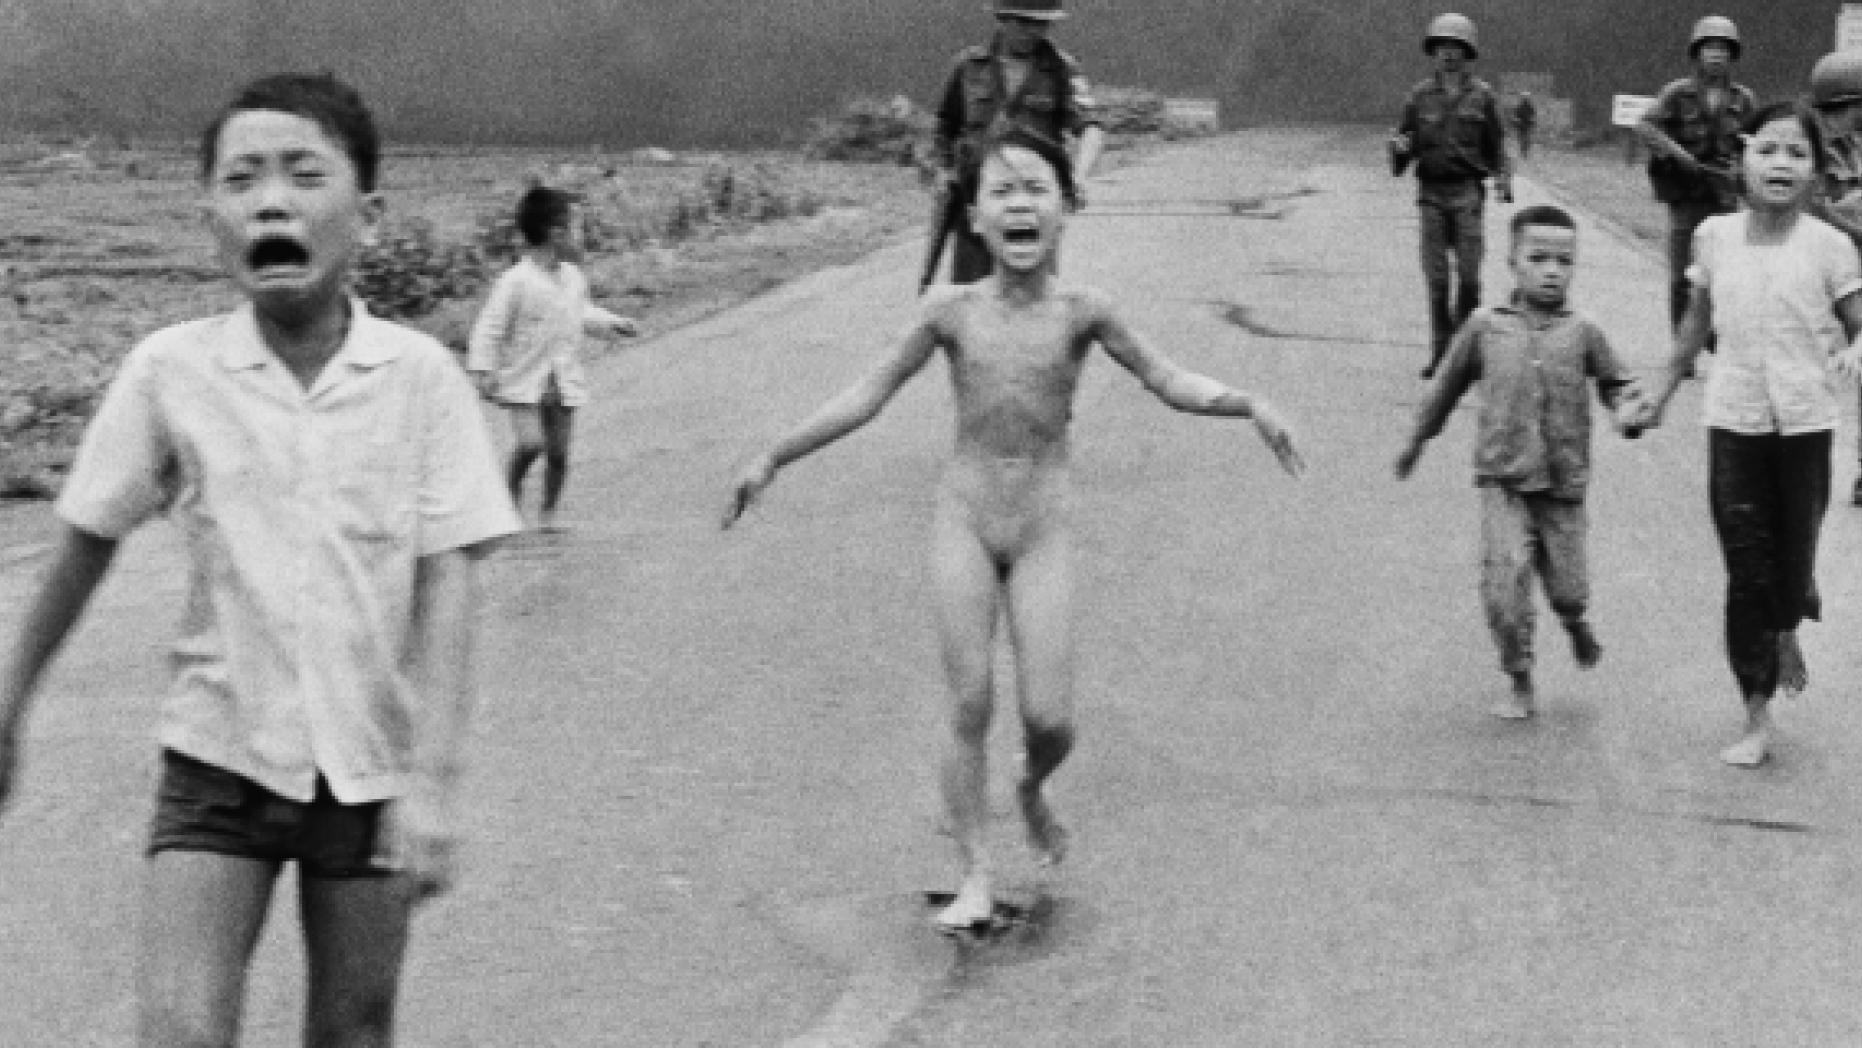 Pulitzer Prize-winning photograph, taken during the Vietnam War – Napalm bombing, by Associate Press photographer Nick Ut in 1972